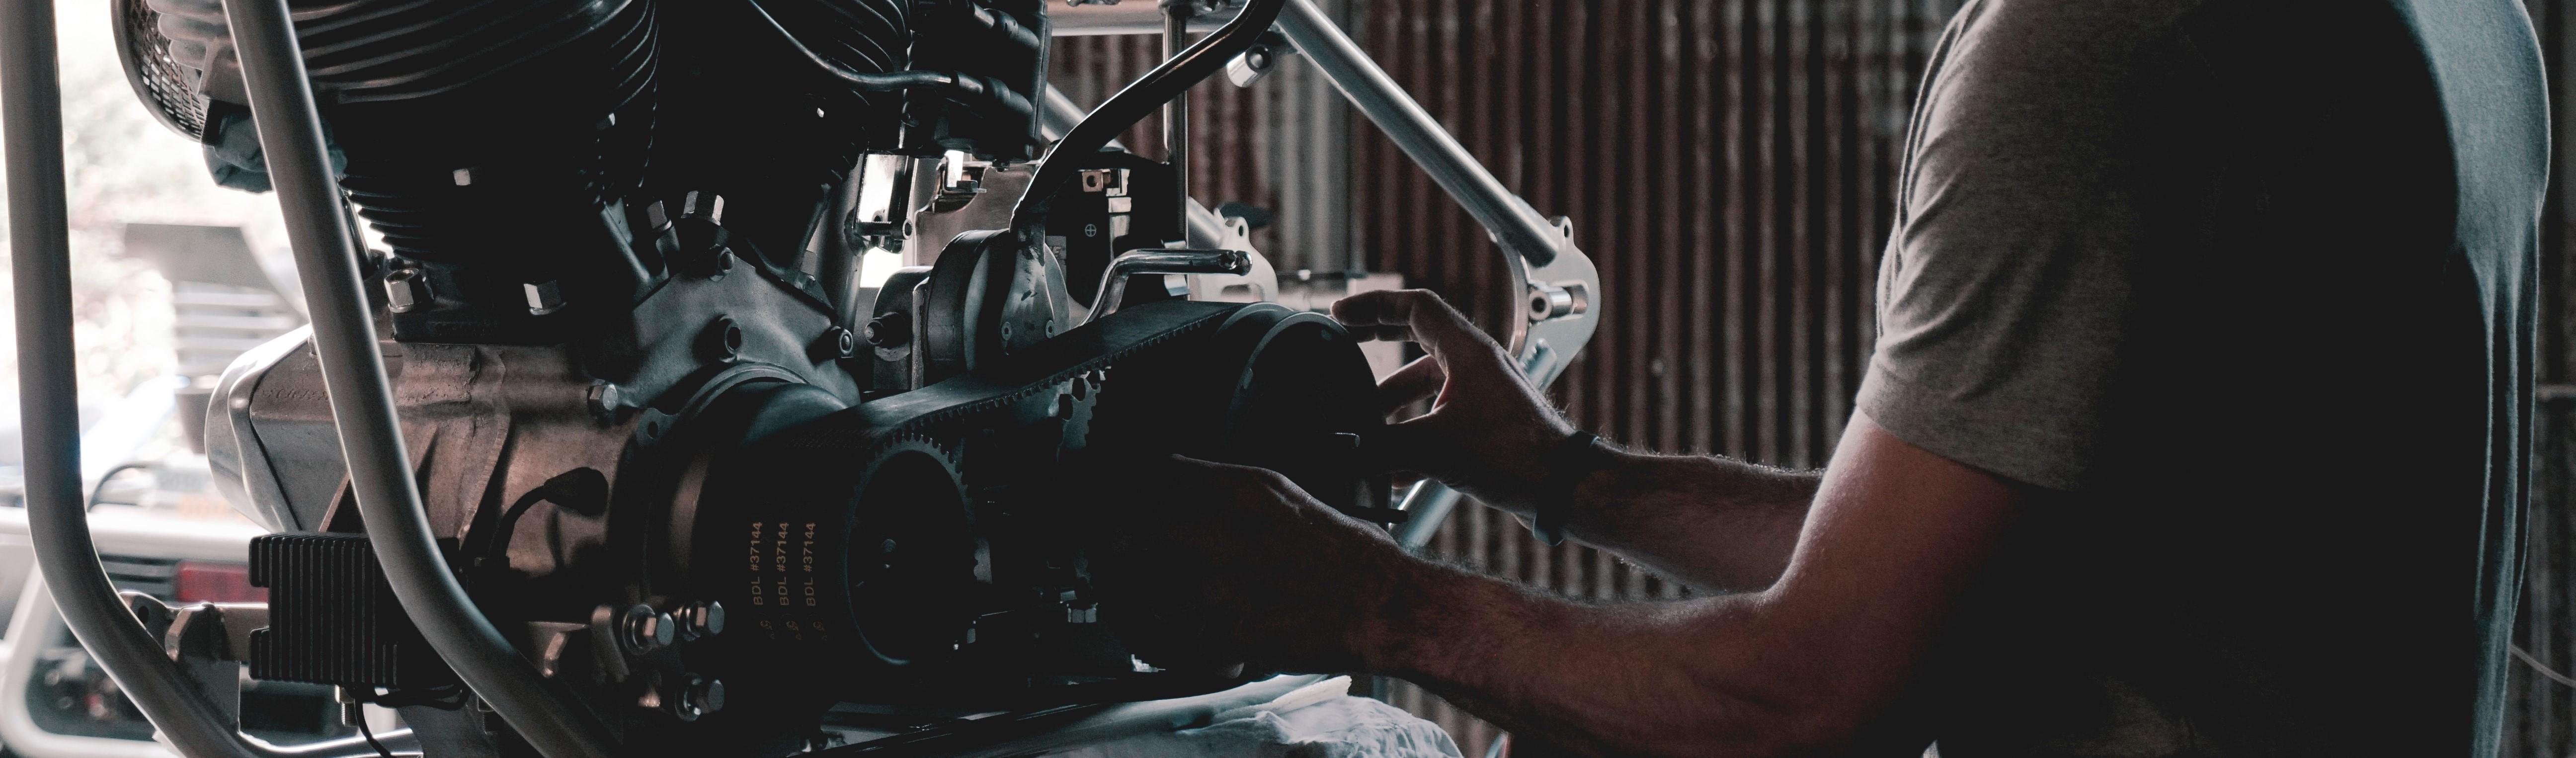 Car Mechanic Checking Transmission - GWCars.org